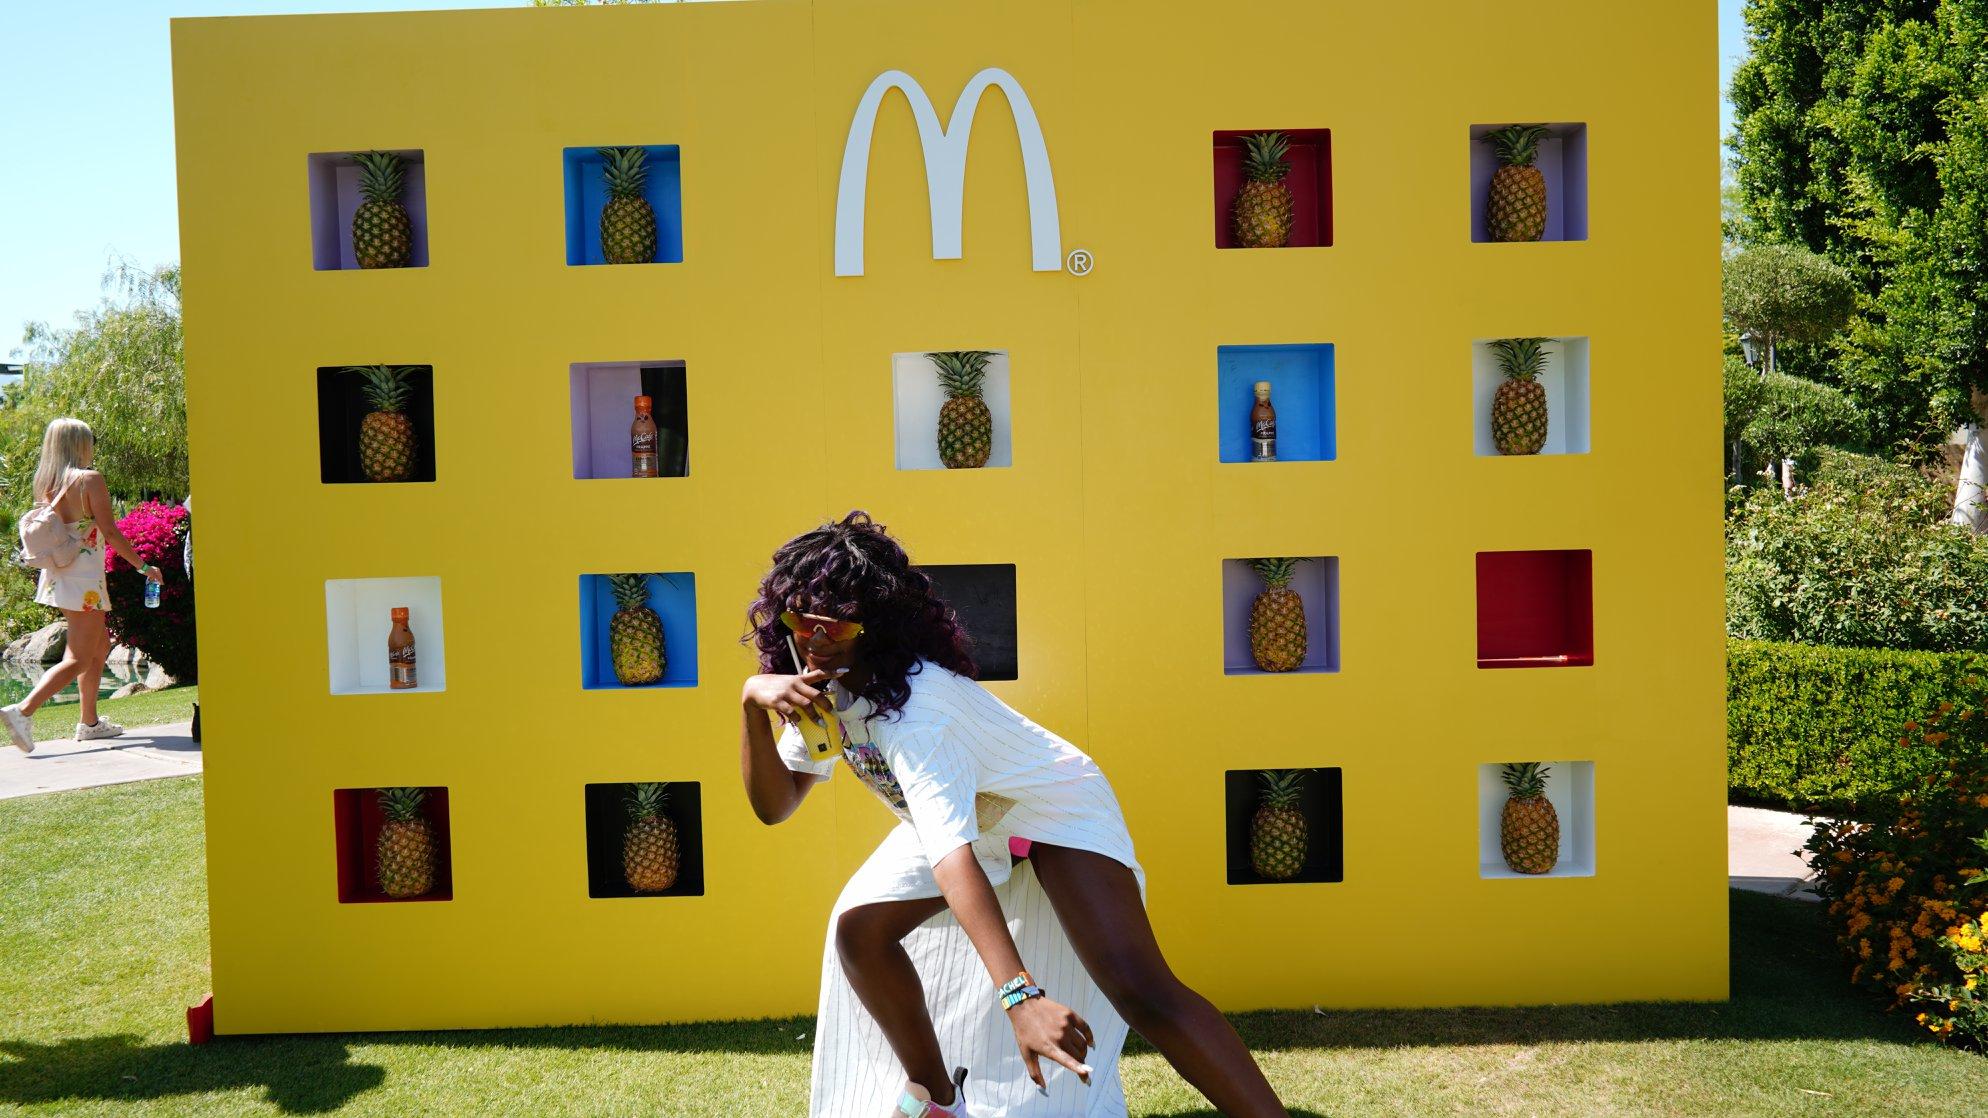 mcdonalds brand event